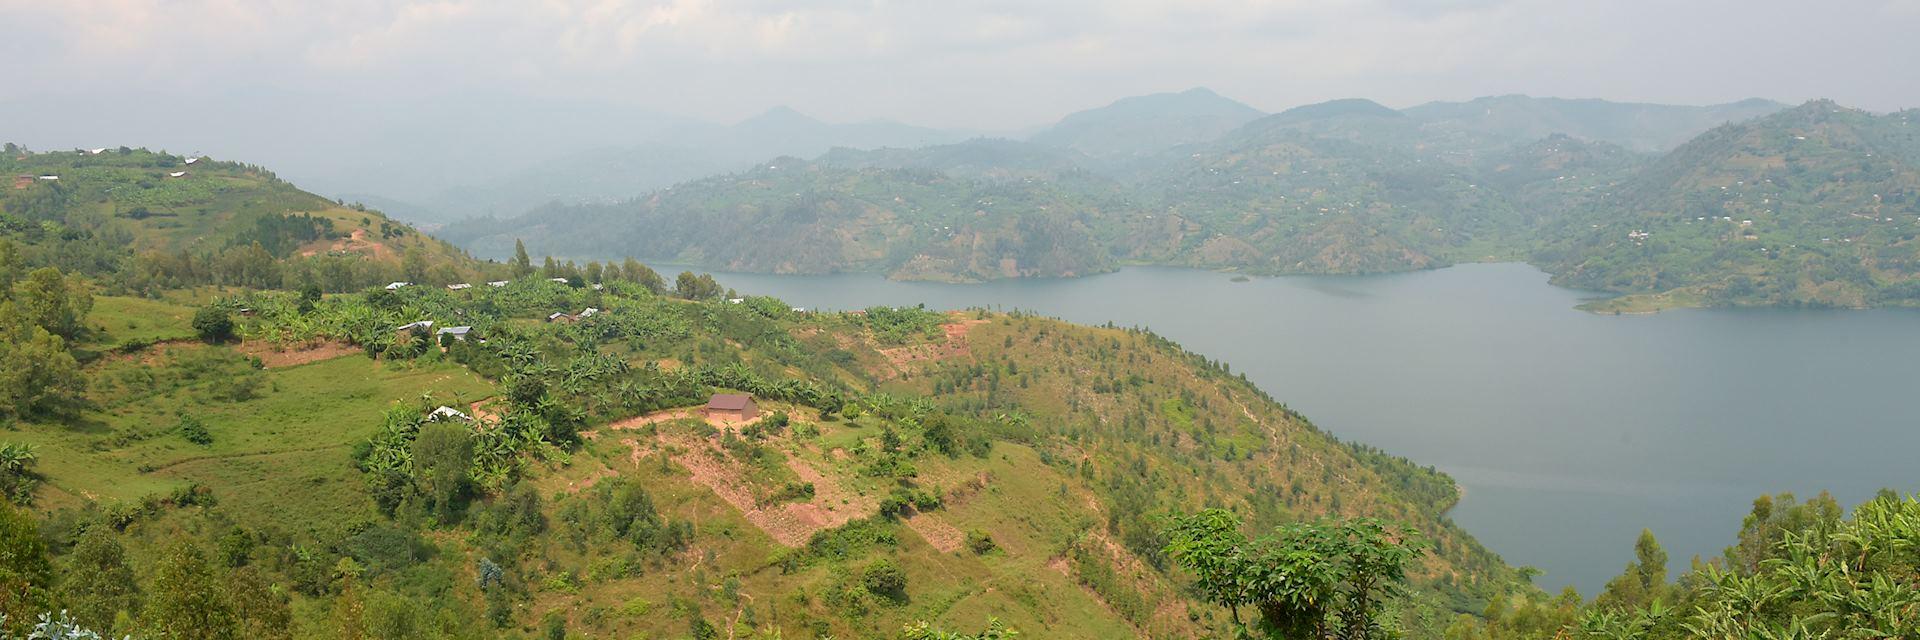 Countryside around Cyangugu